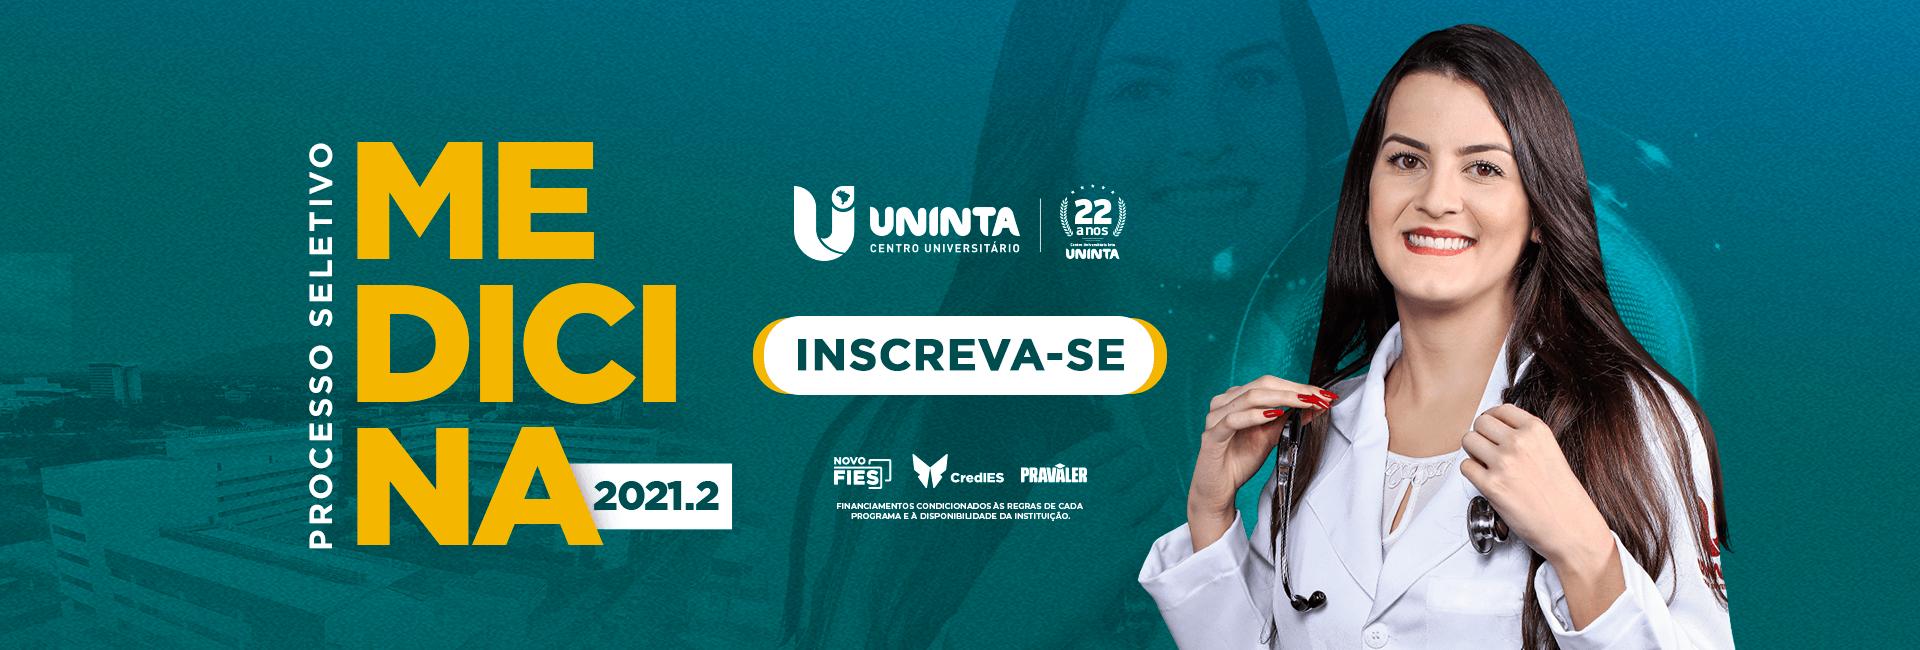 banner-medicina-uninta-01